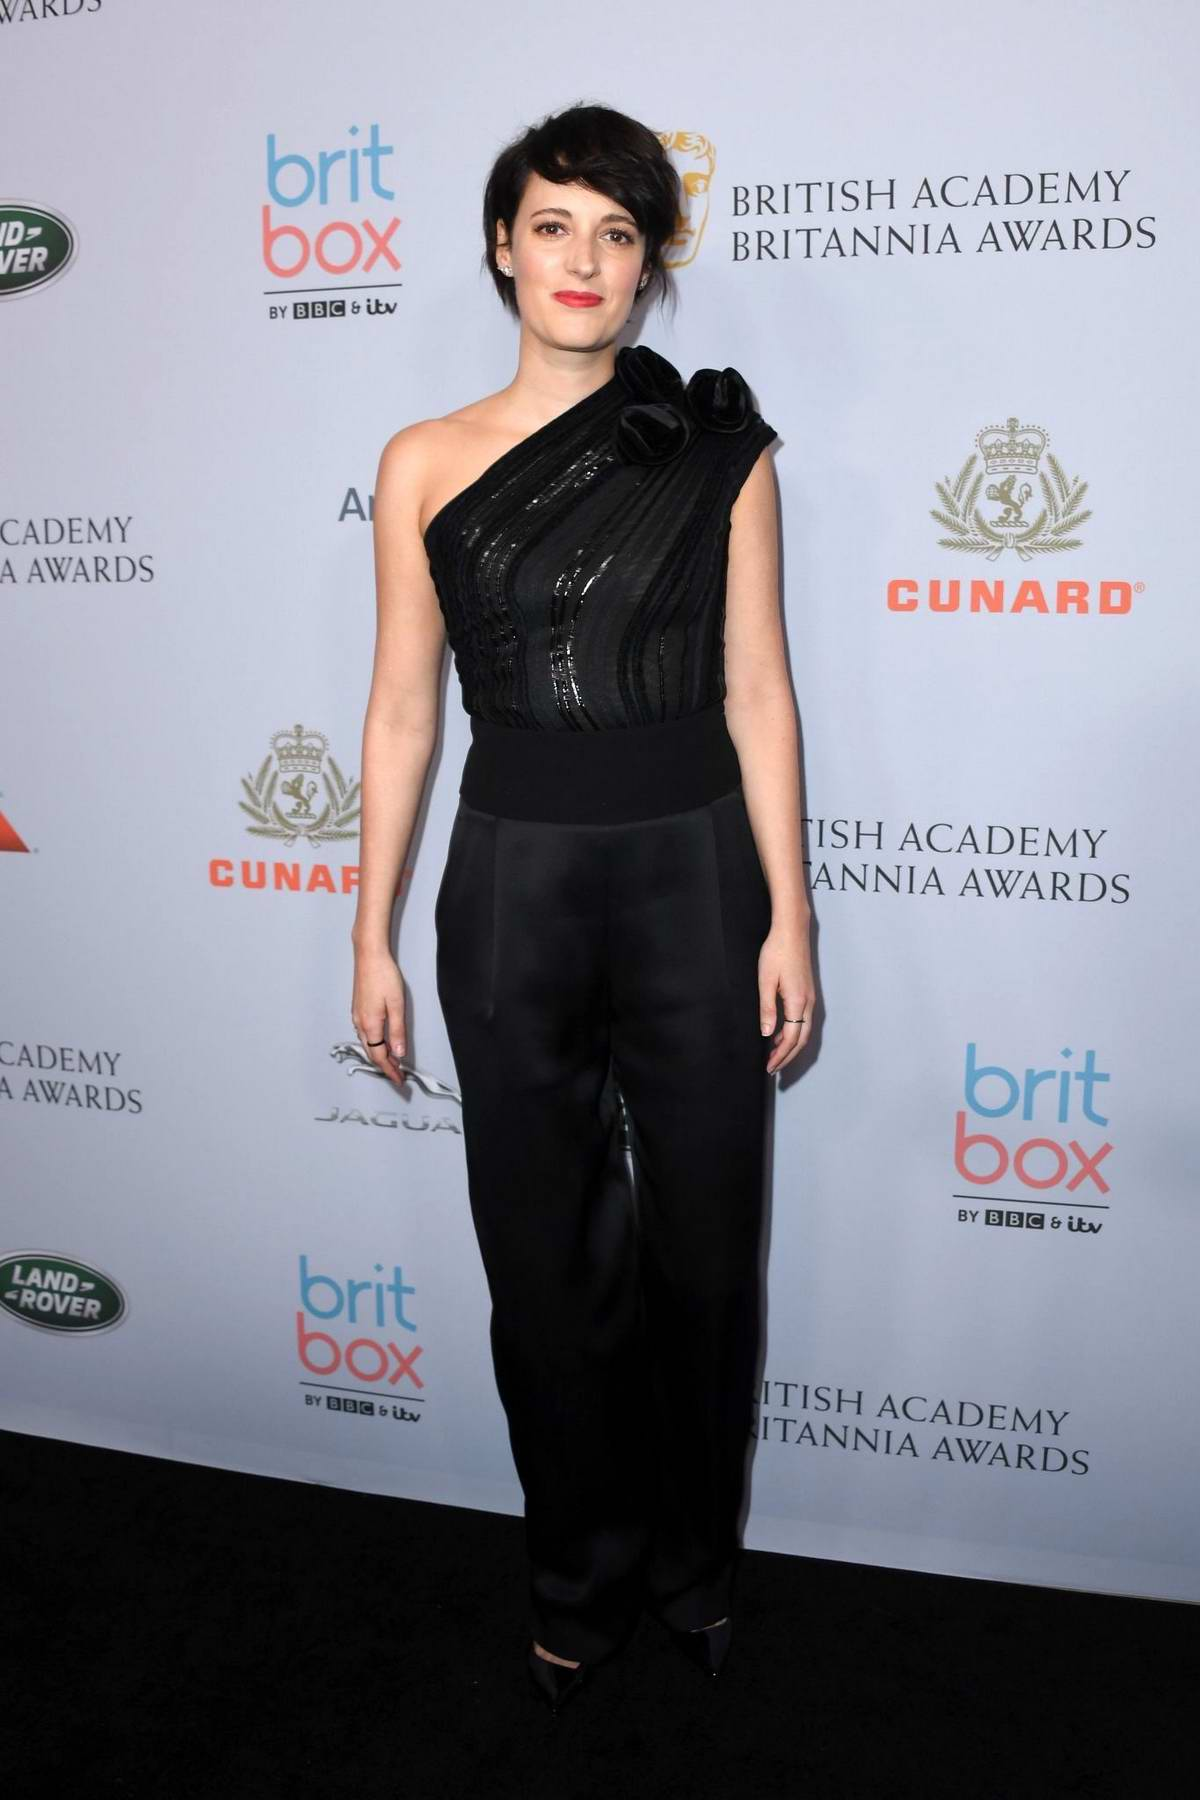 Phoebe Waller-Bridge attends the British Academy Britannia Awards 2019 in Beverly Hills, California